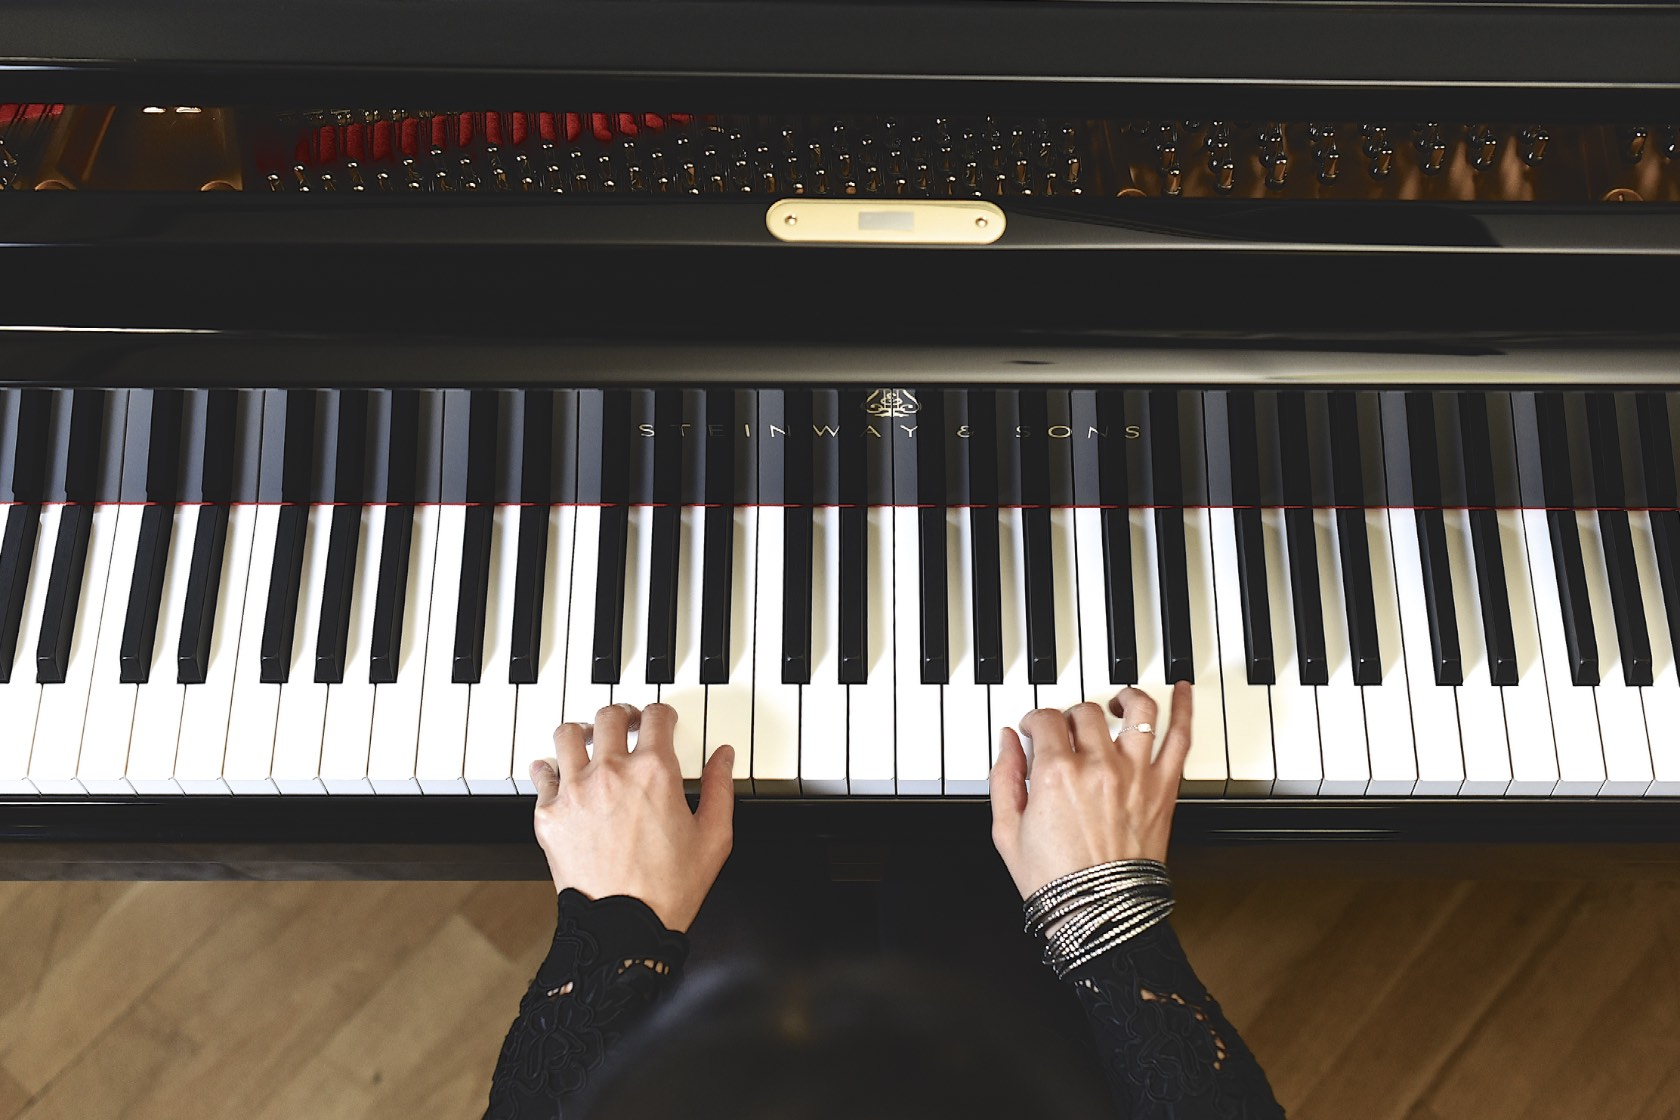 Aisa ljiri playing piano. Photo: Lugermad